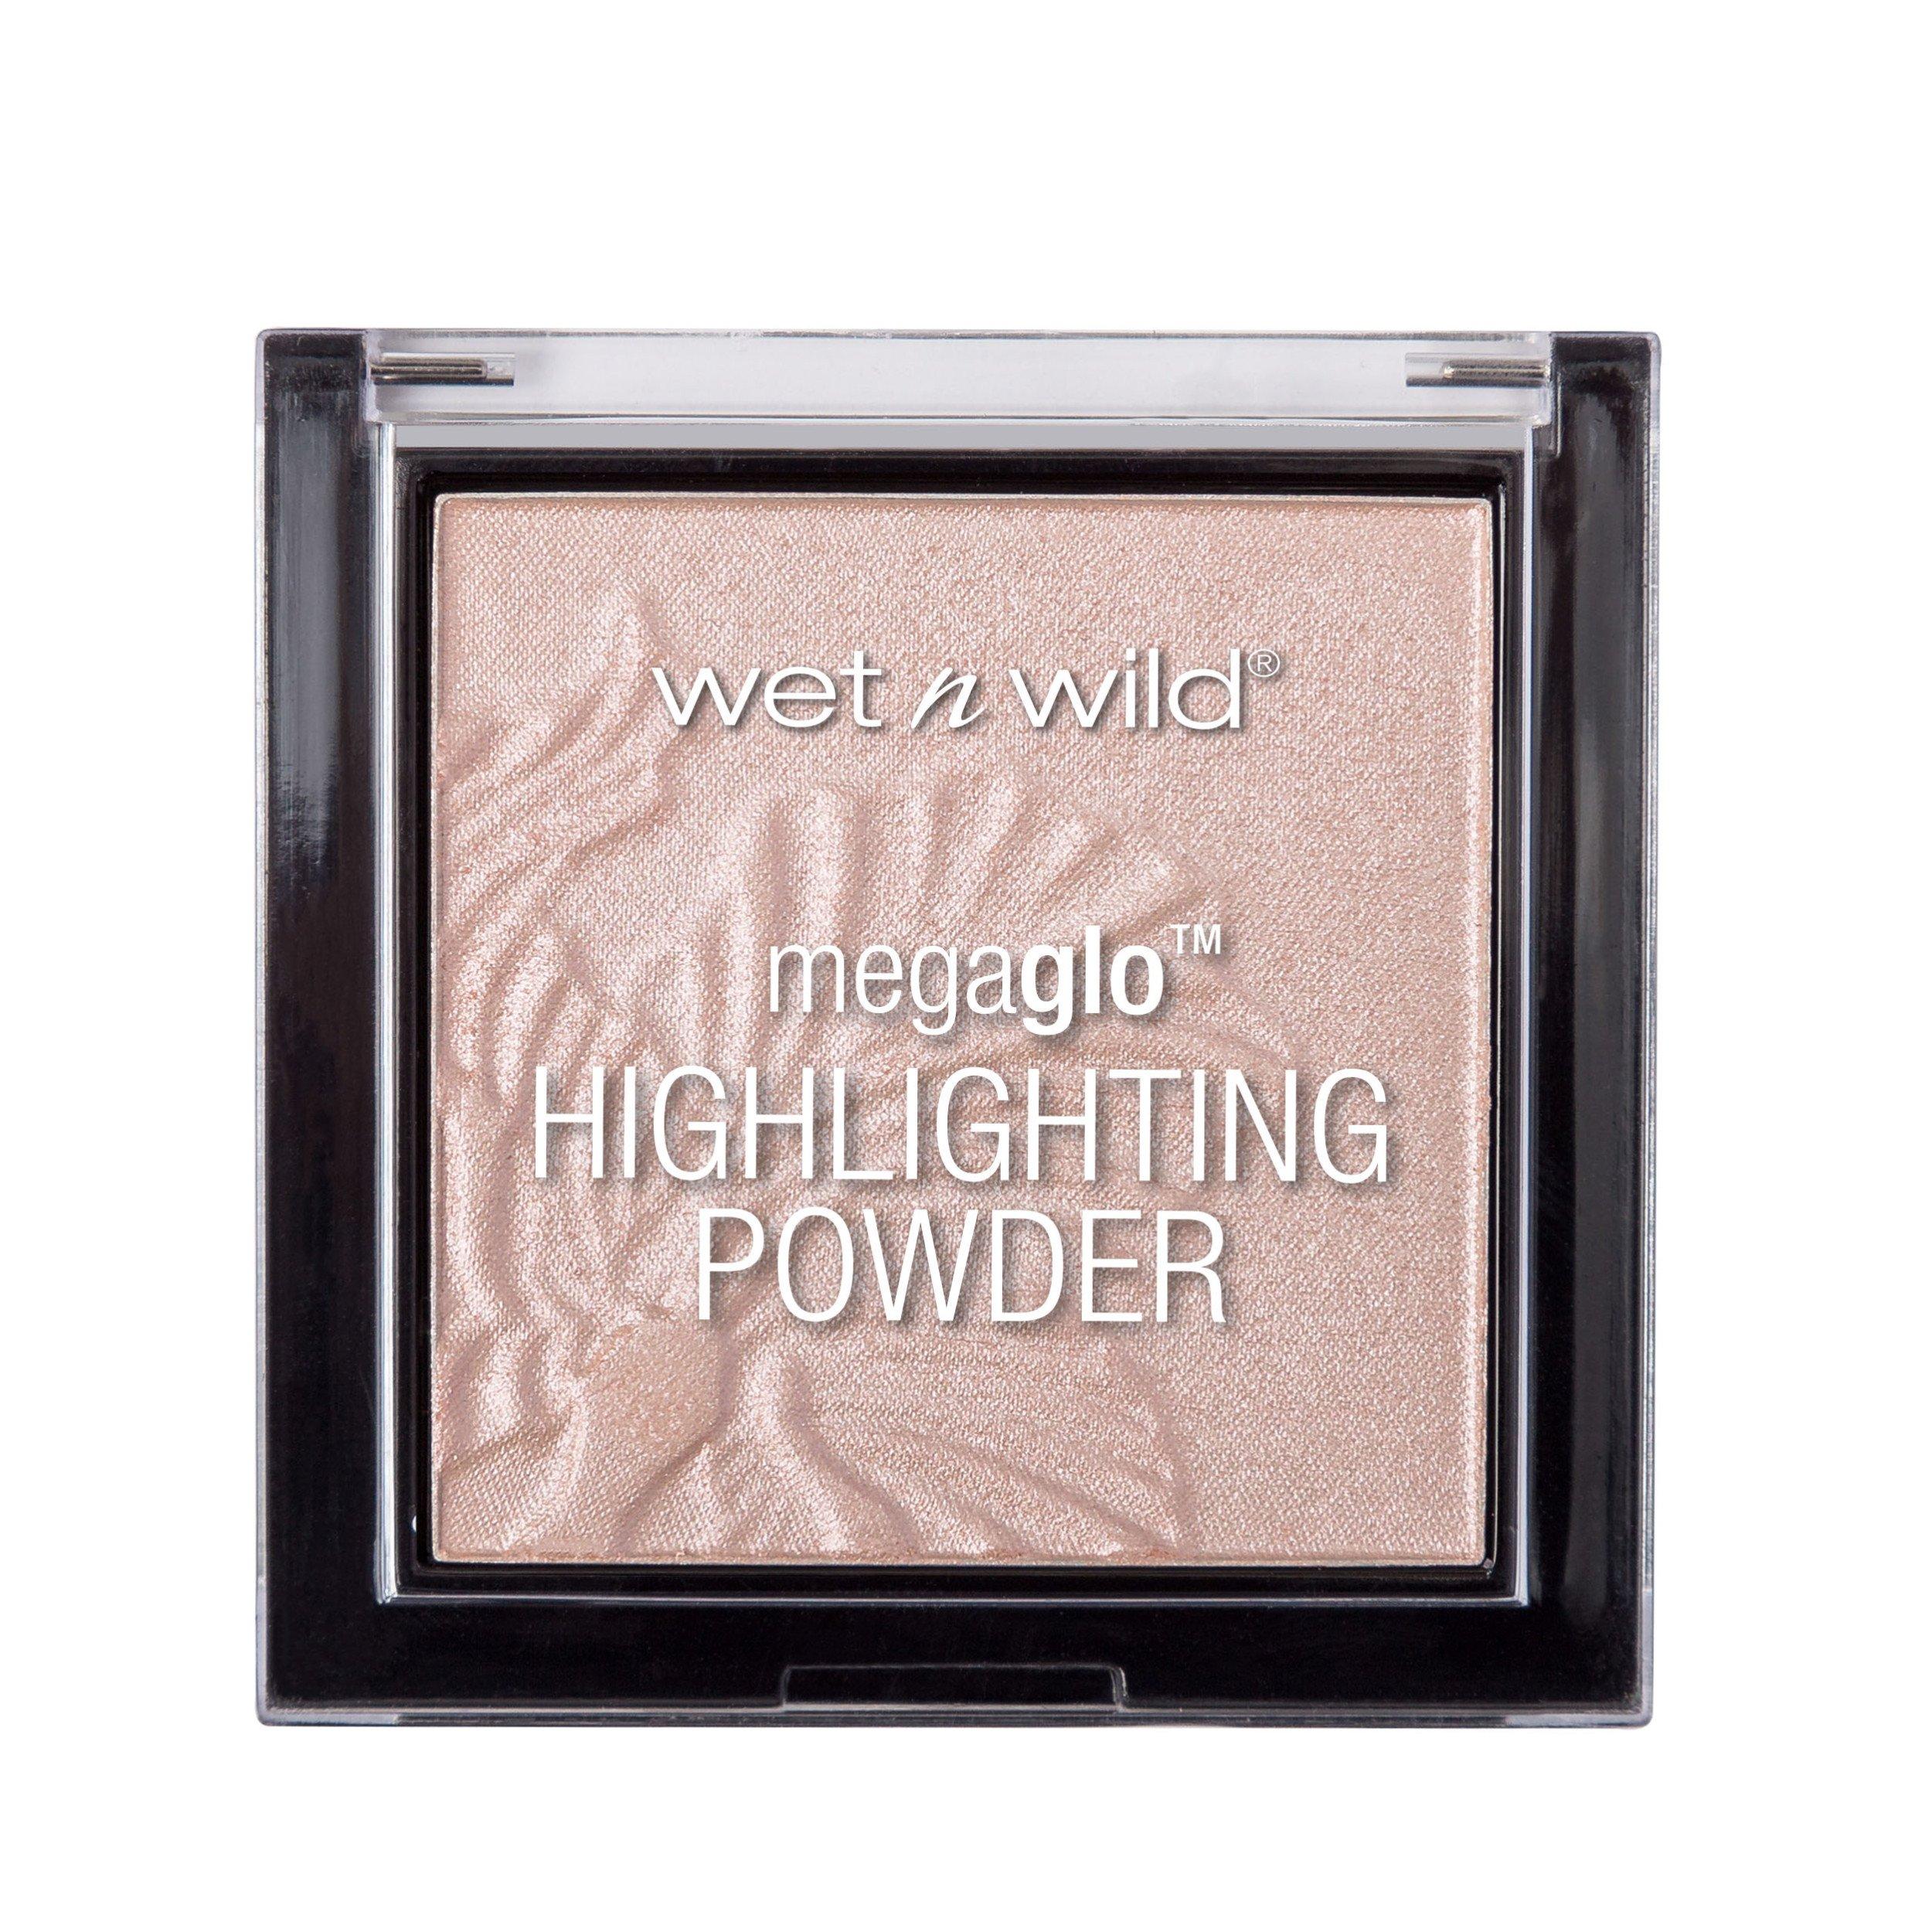 wet n wild Megaglo Highlighting Powder, Blossom Glow